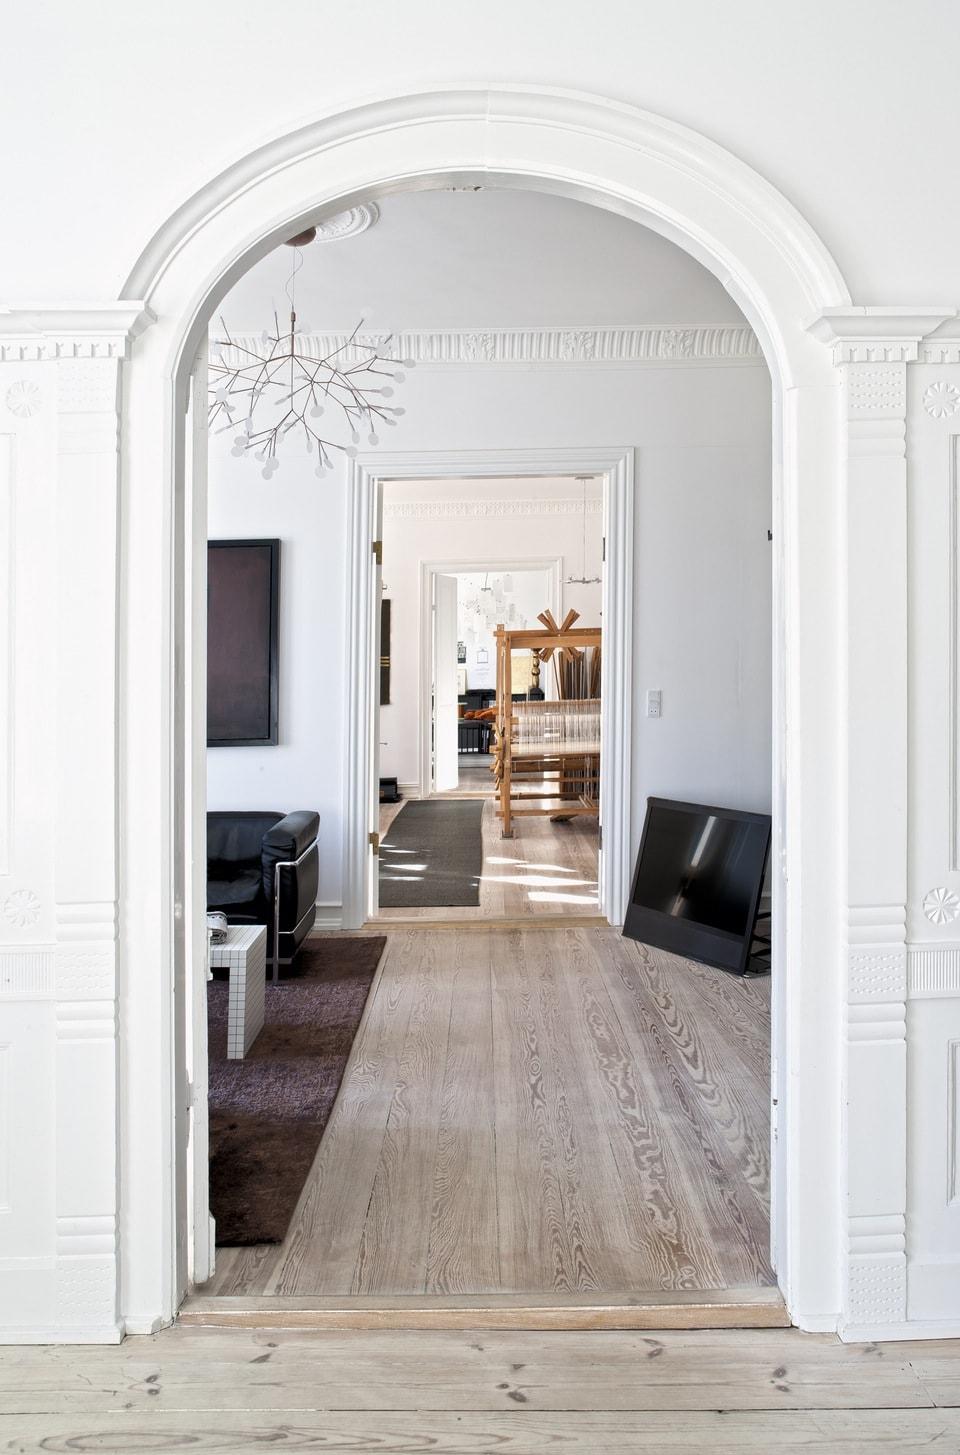 Home of a textile designer - COCO LAPINE DESIGNCOCO LAPINE DESIGN